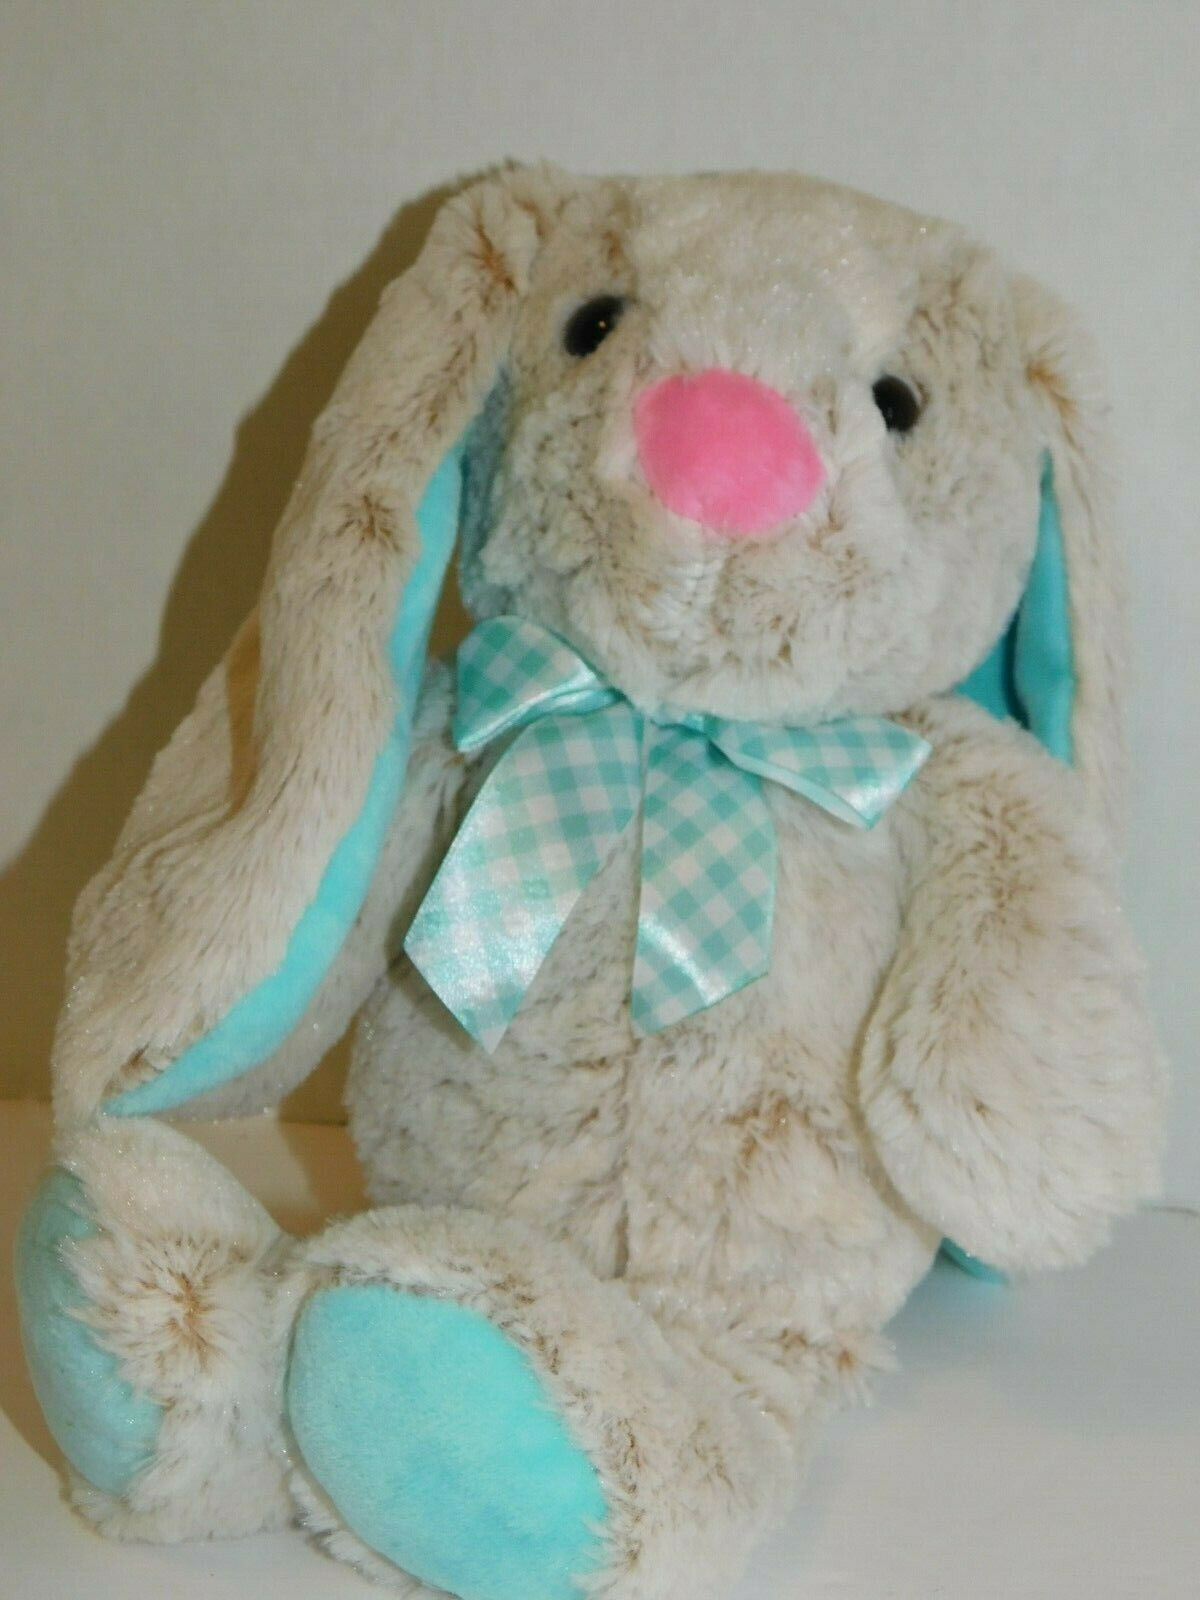 Easter Bunny Rabbit Stuffed Plush Animal 14 Inches Long Ears 49022075177 Ebay Animal Plush Toys Big Stuffed Animal Bunny Plush [ 1600 x 1200 Pixel ]